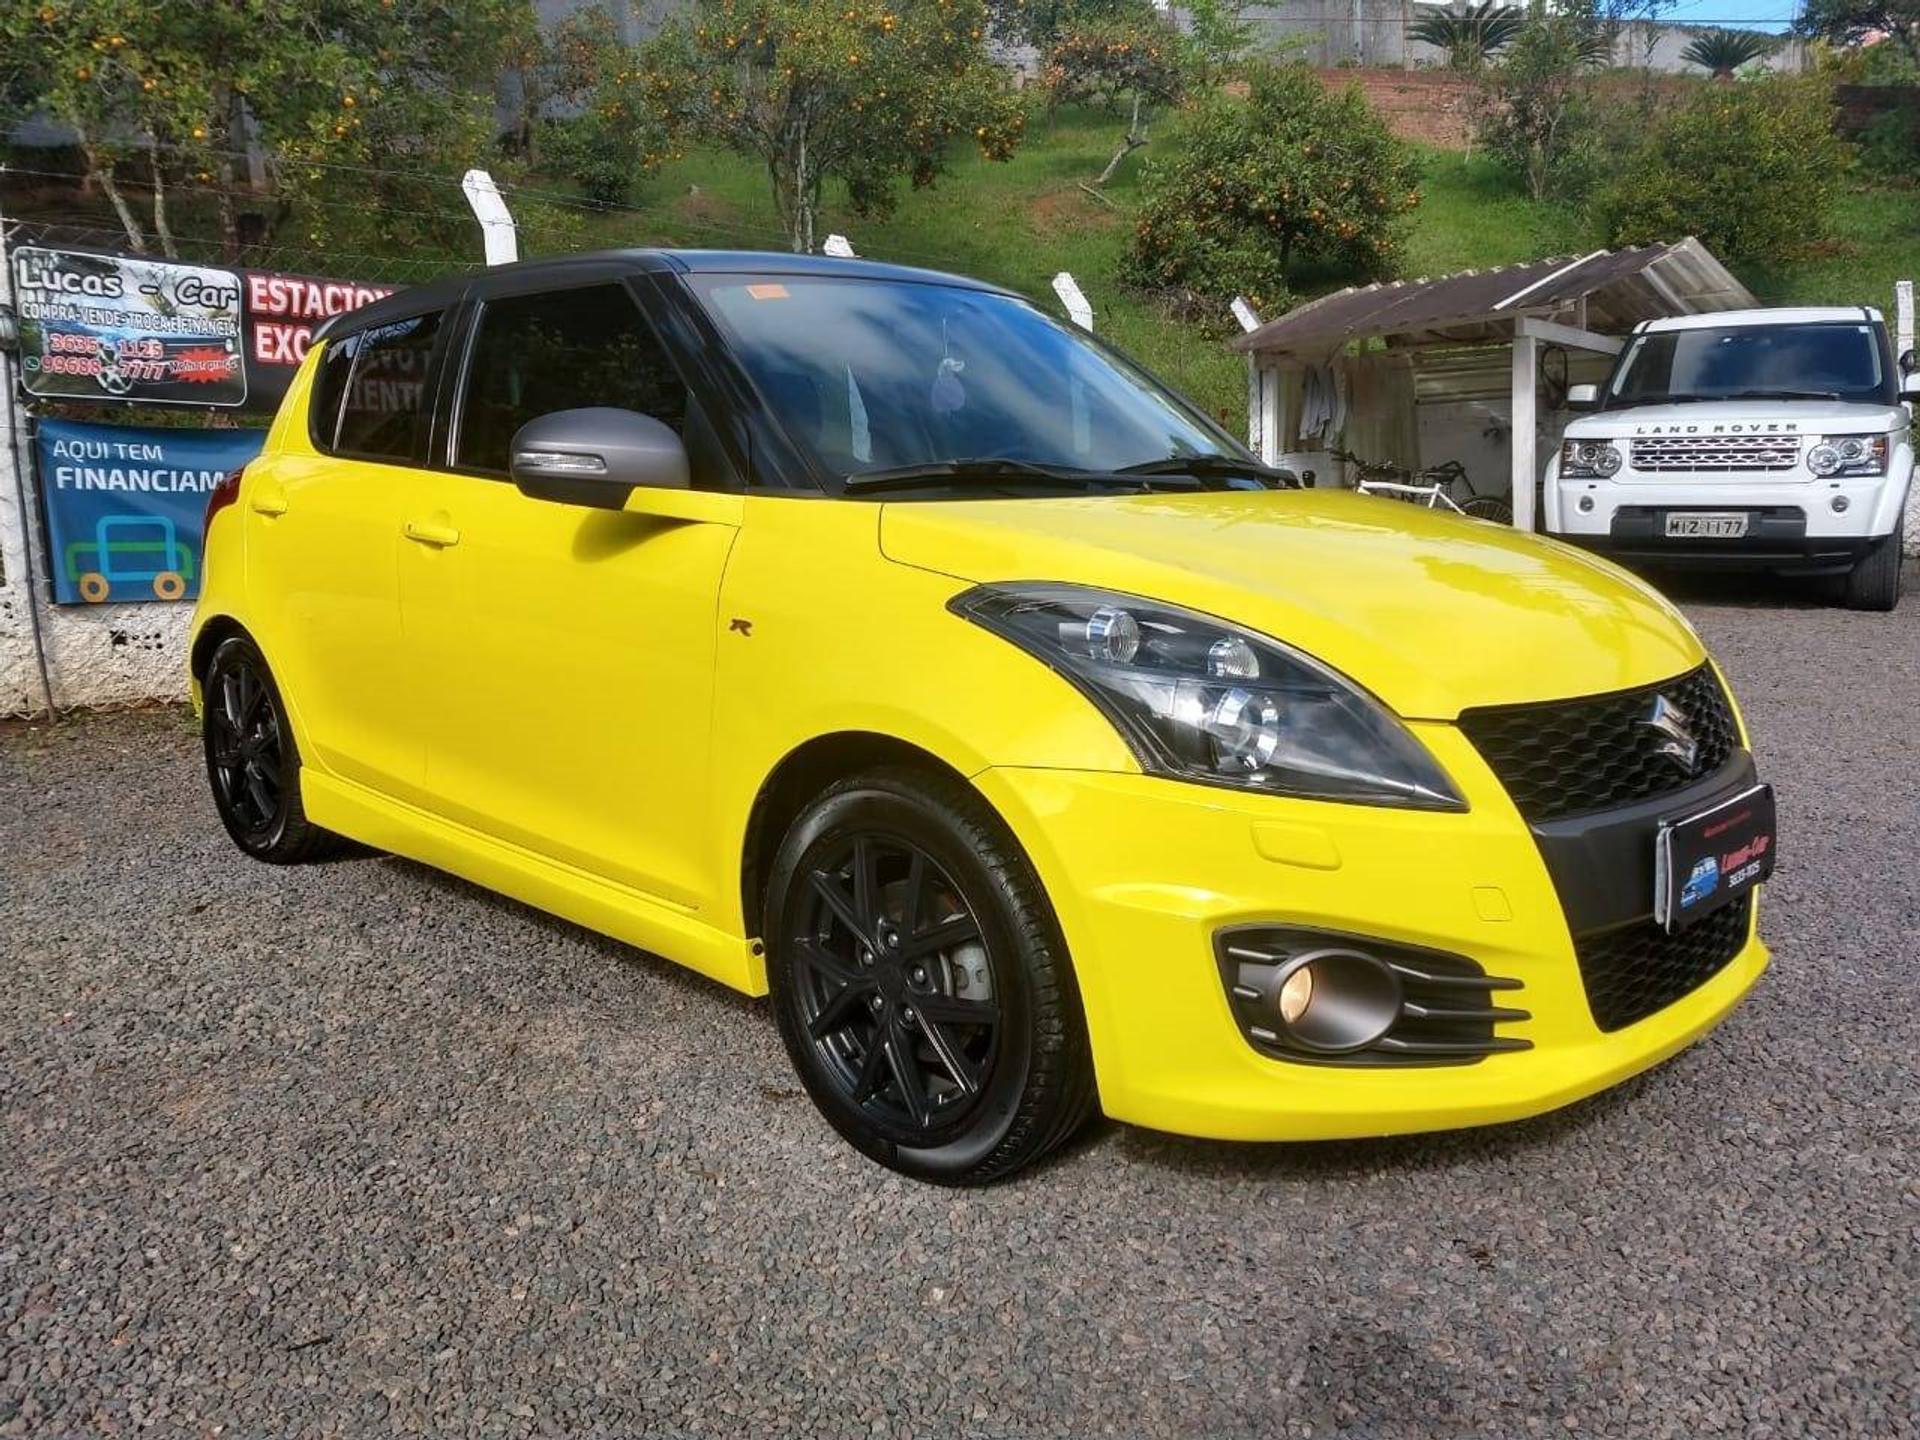 Suzuki Swift 1.6 Sport R 16v Gasolina 4p Manual Wmimagem10523691422